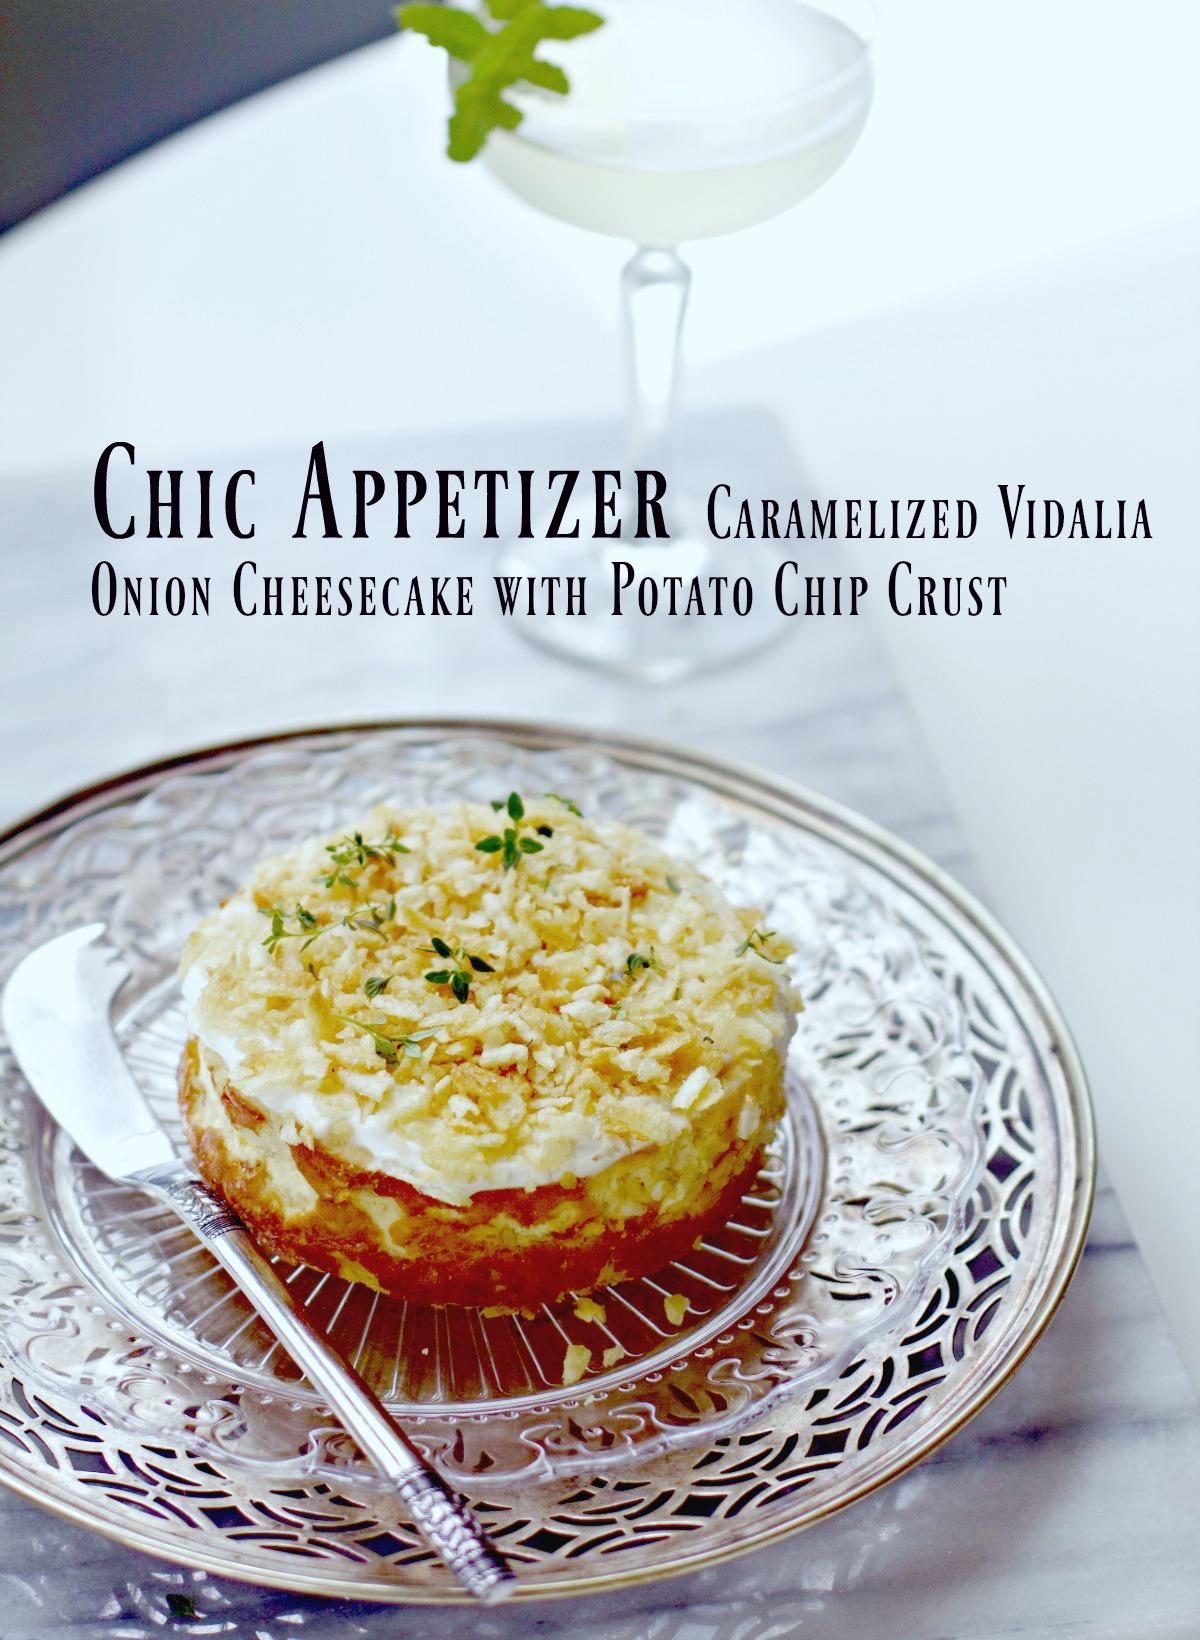 Vidalia Caramelized Onion Cheesecake Appetizer